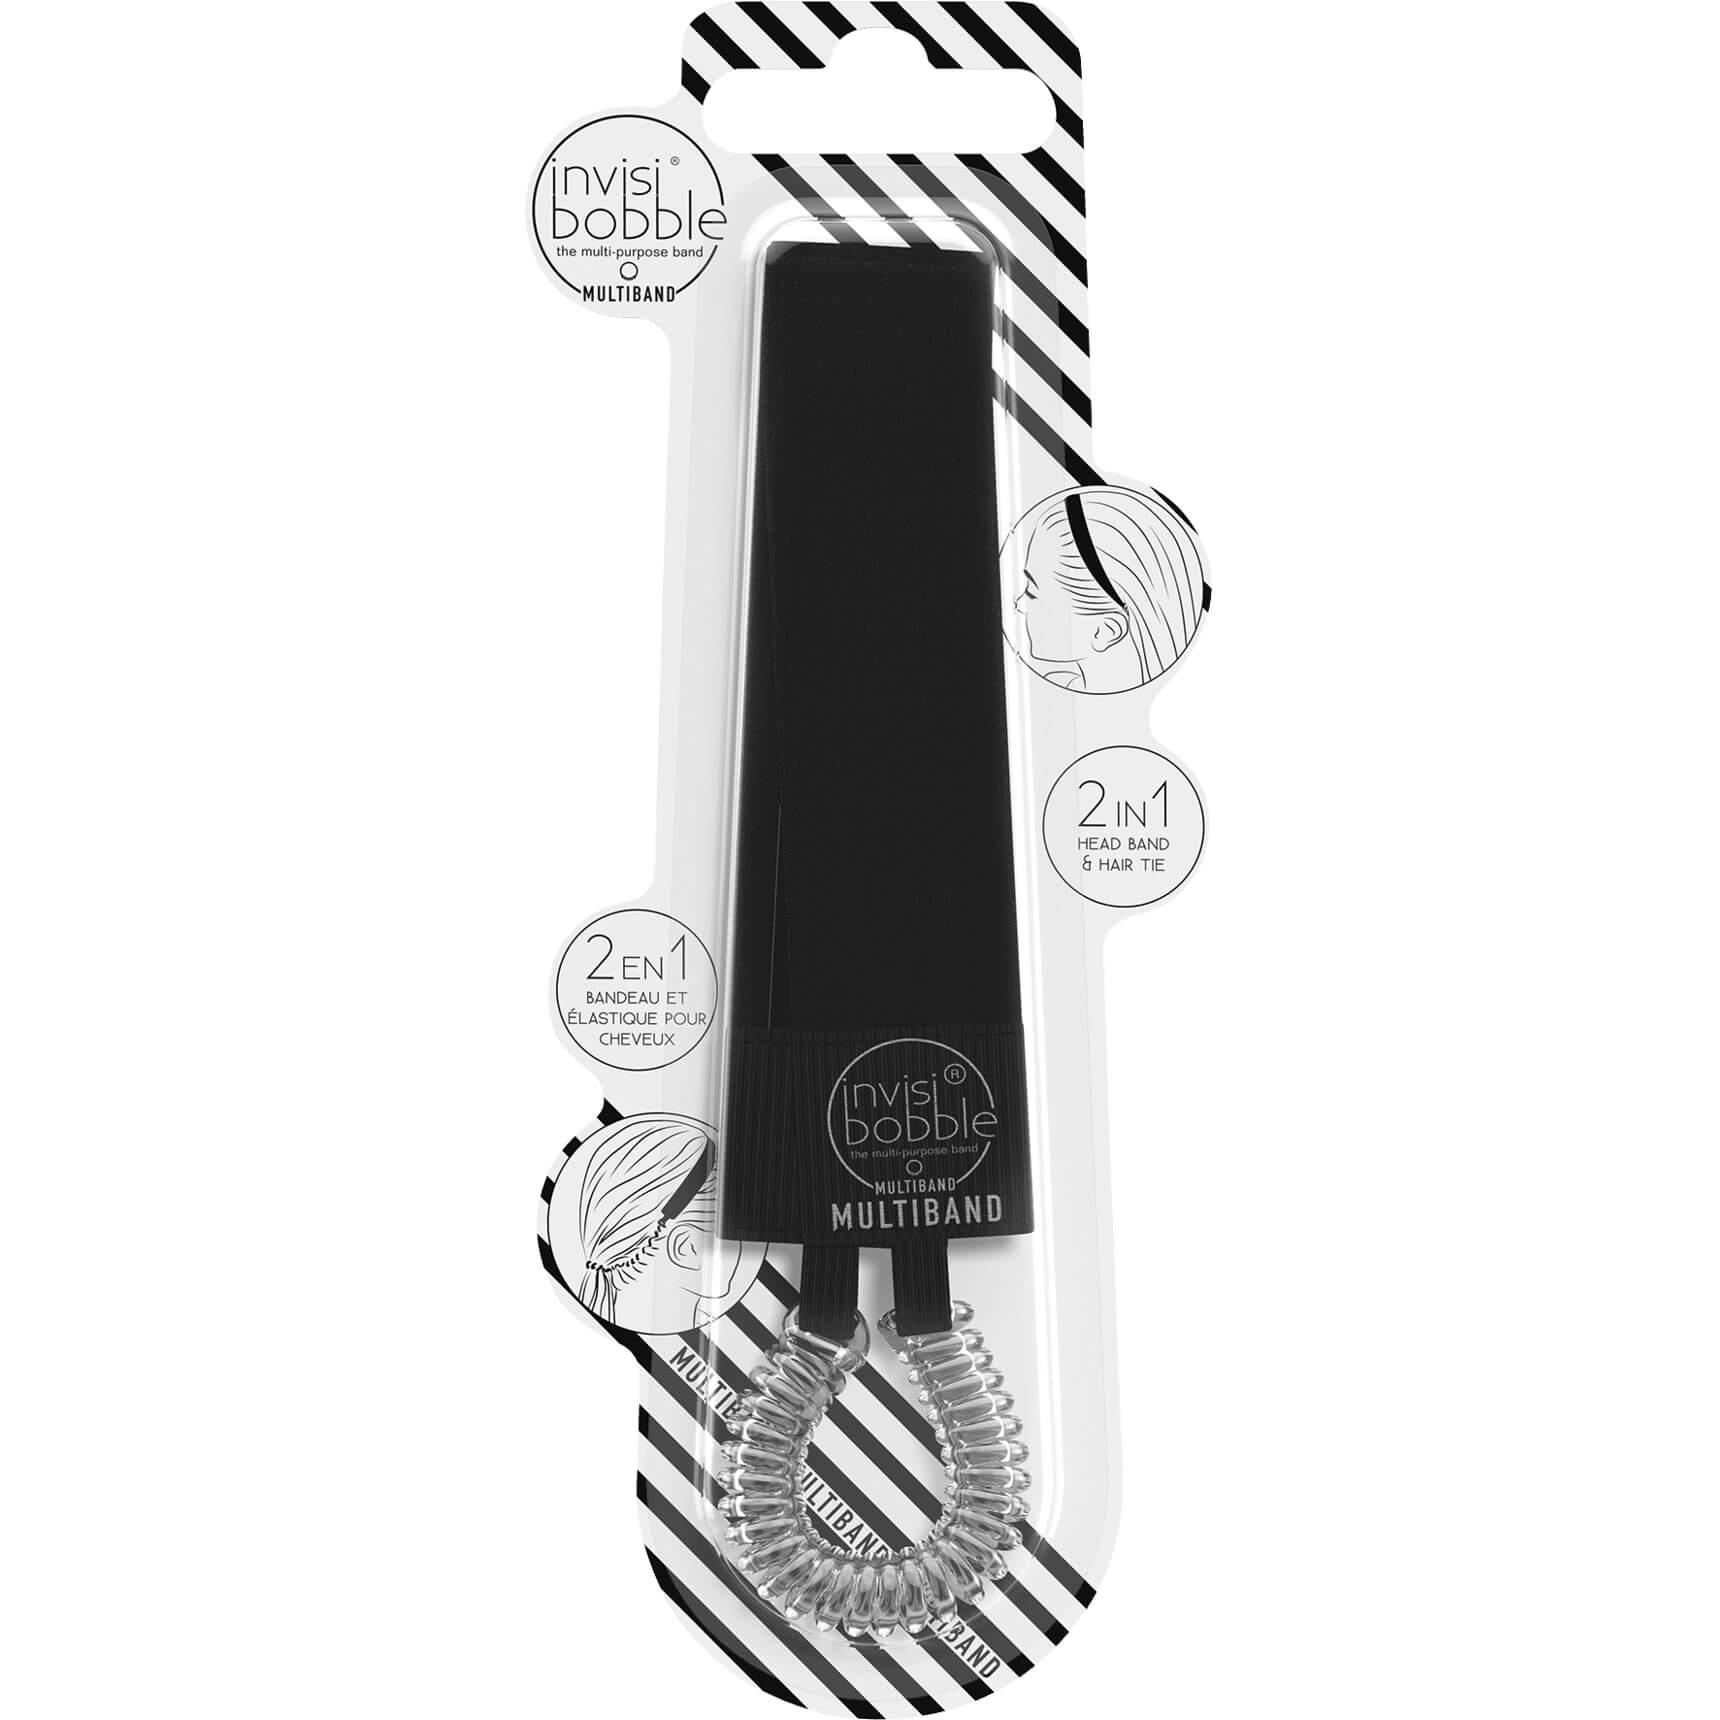 Invisibobble Multiband True BlackΚορδέλα -Λαστιχάκι Μαλλιών υγιεινή   φροντίδα μαλλιών   φορμάρισμα μαλλιών  amp  αξεσουάρ